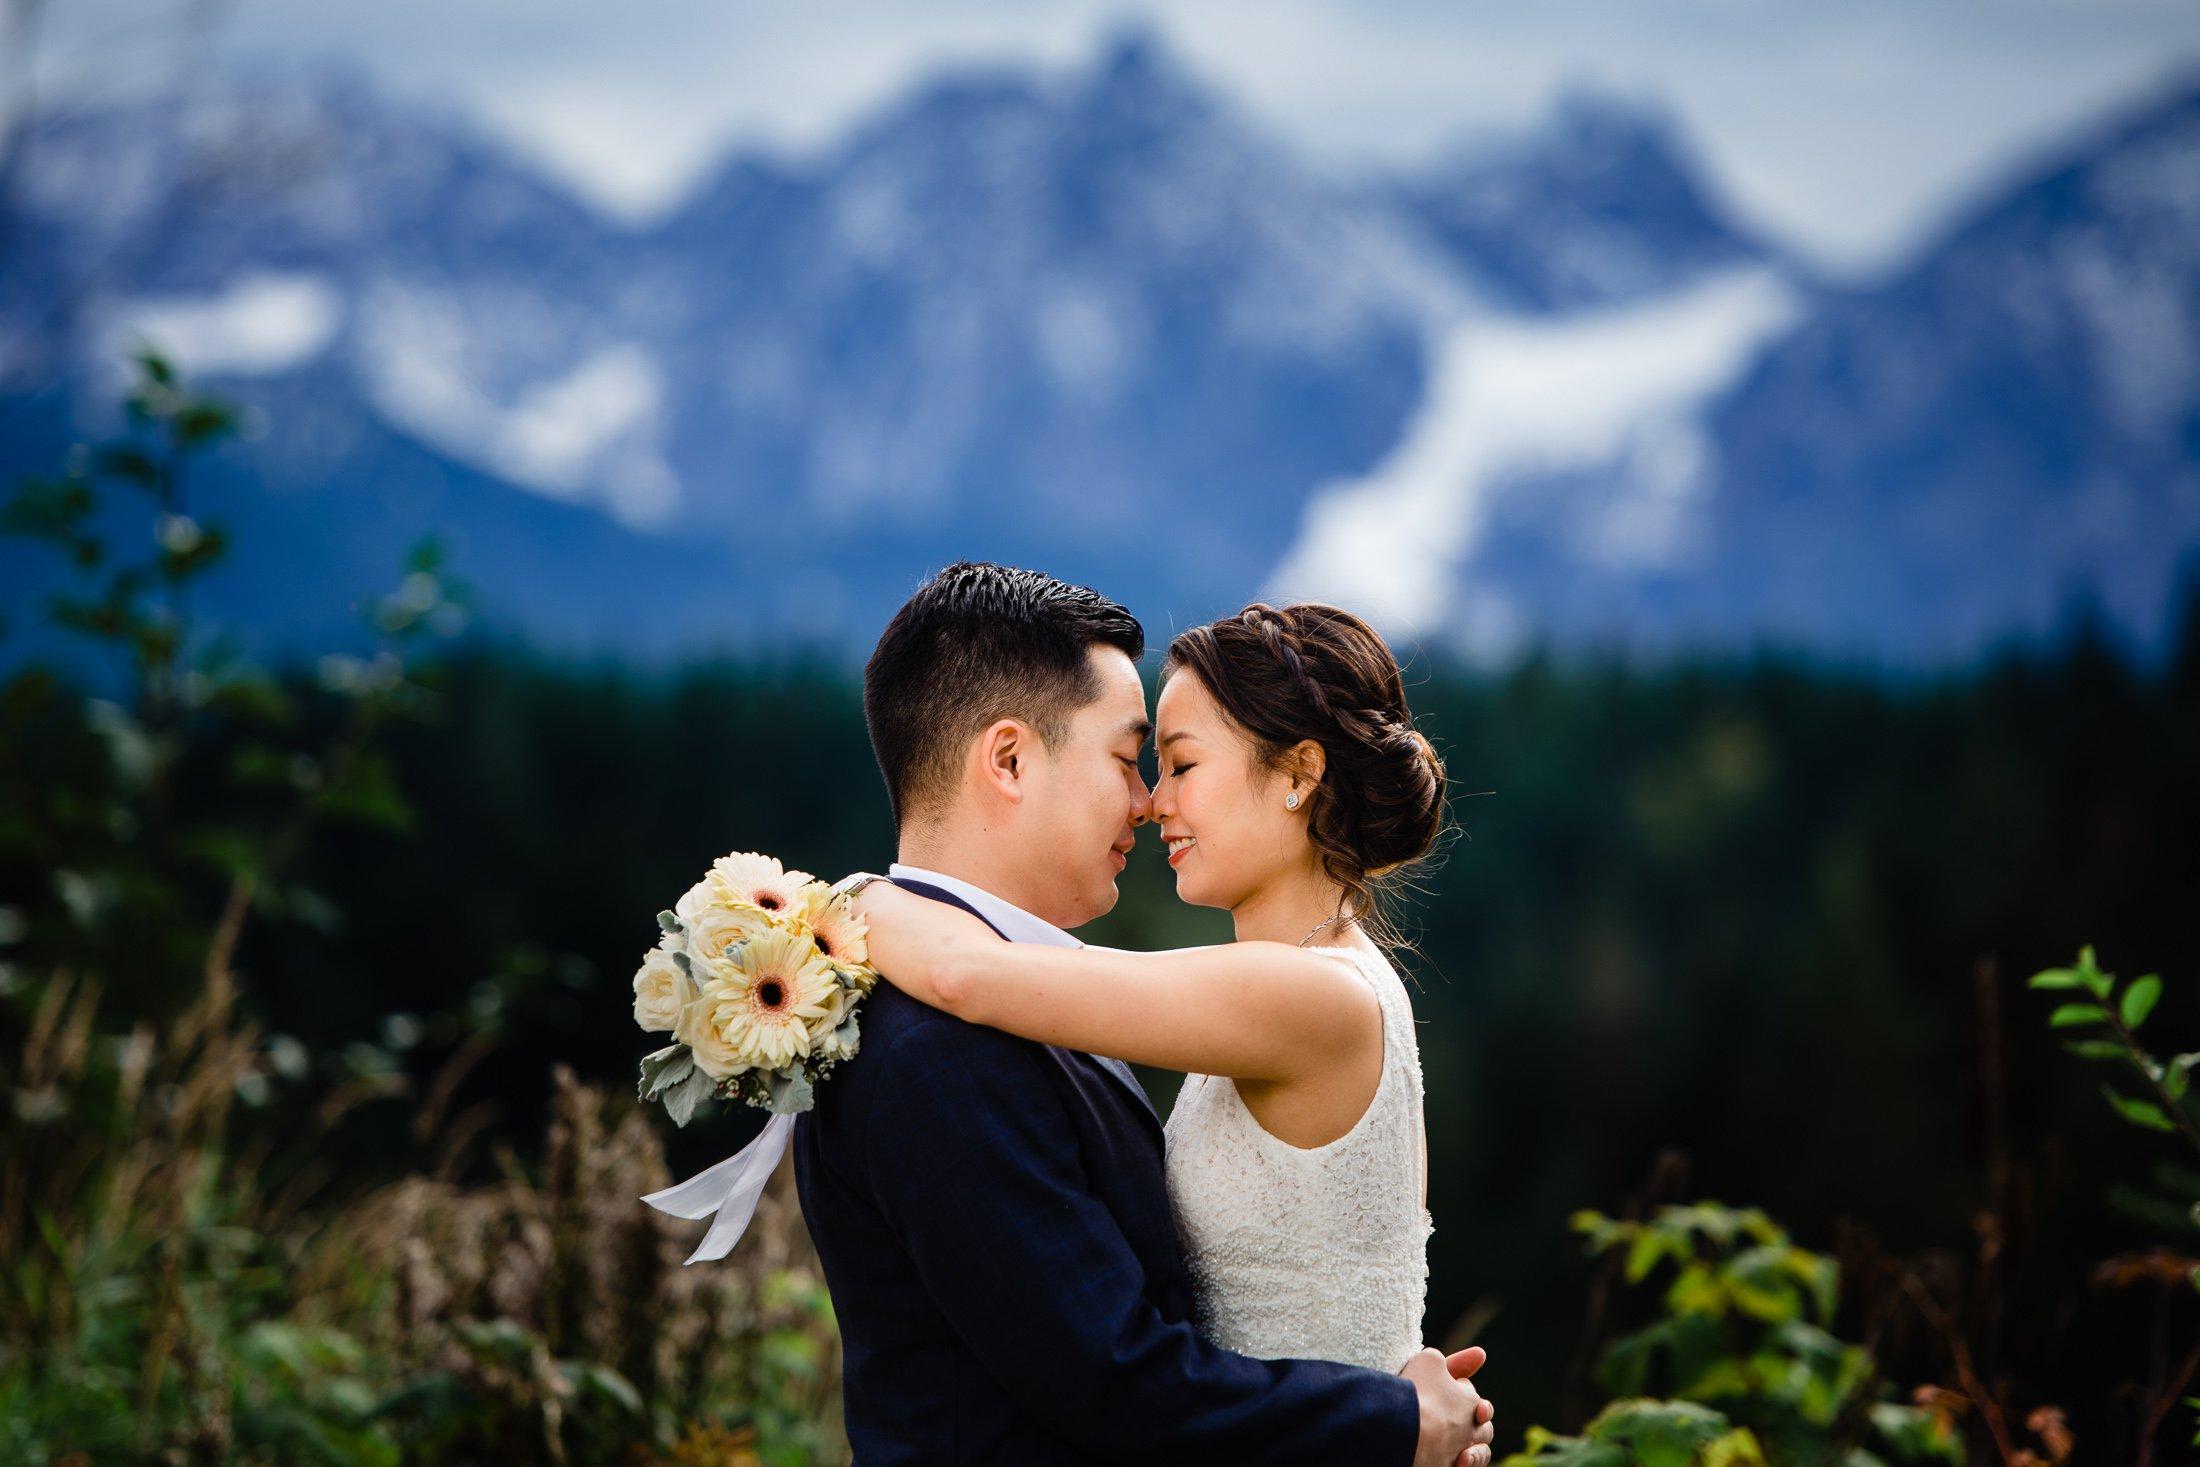 002 - fraser valley mountain elopement